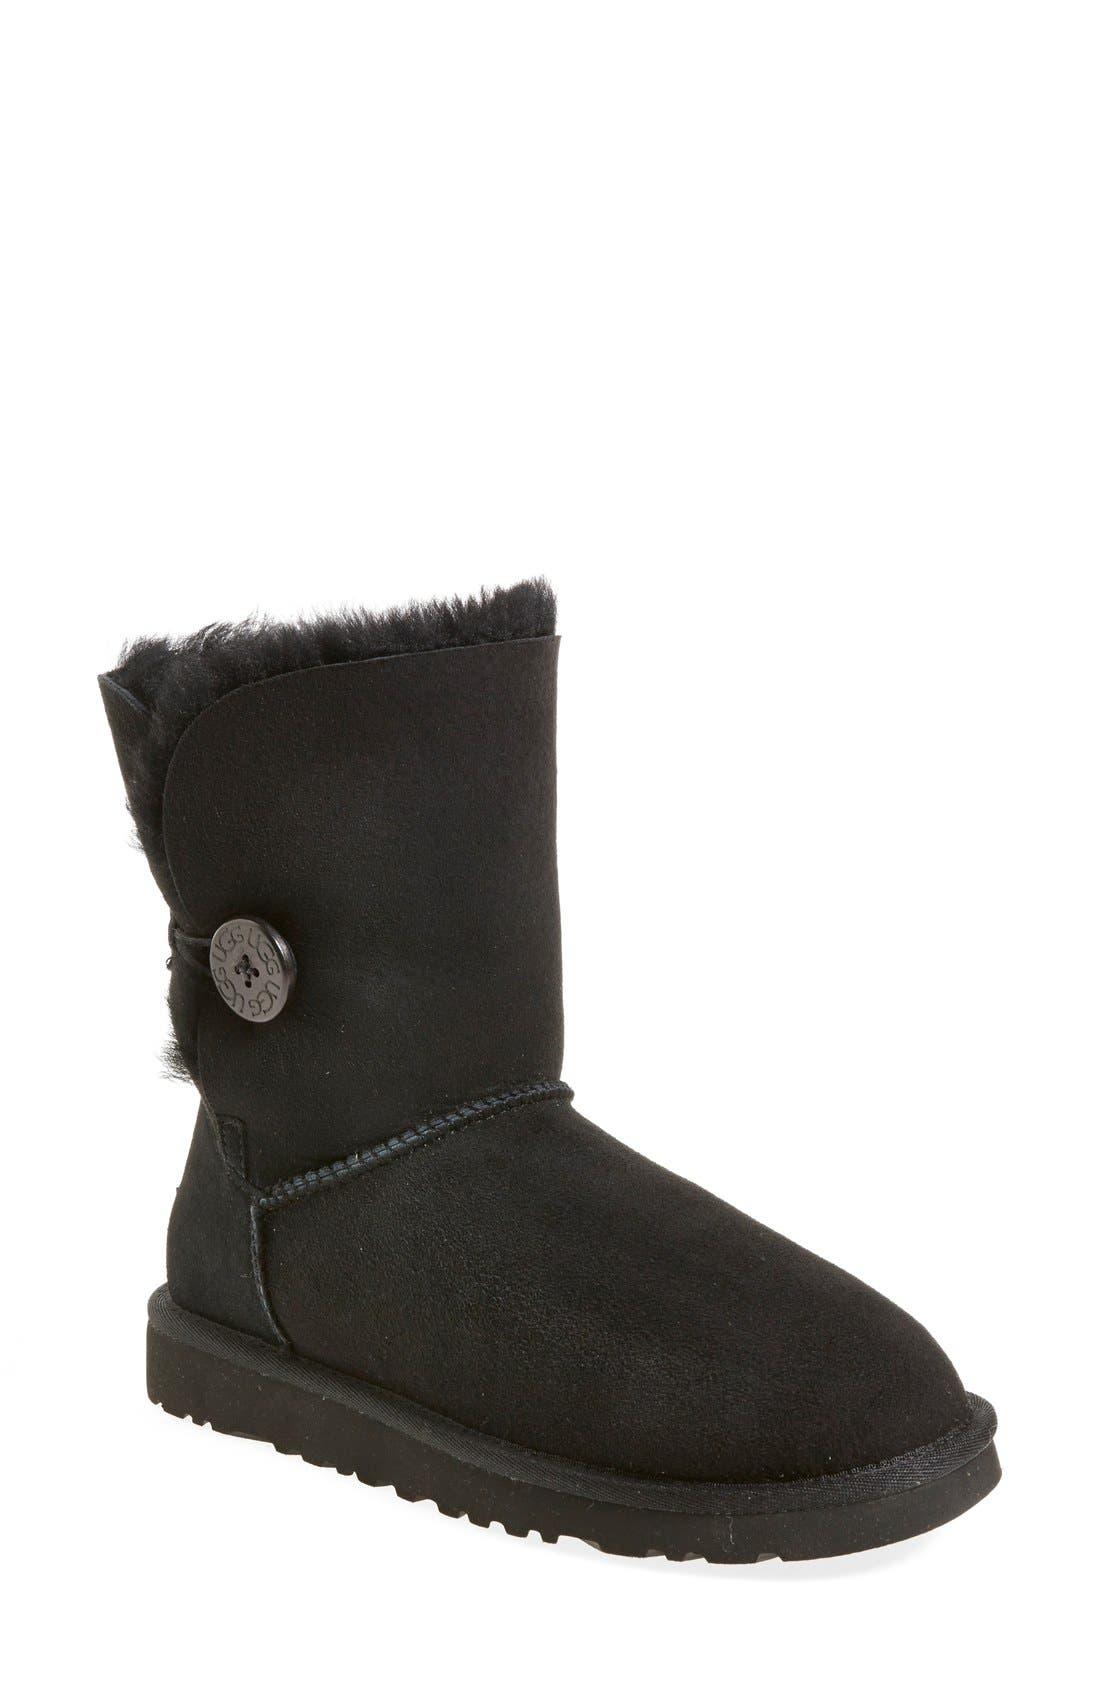 UGG<SUP>®</SUP>, 'Bailey Button' Boot, Main thumbnail 1, color, 001